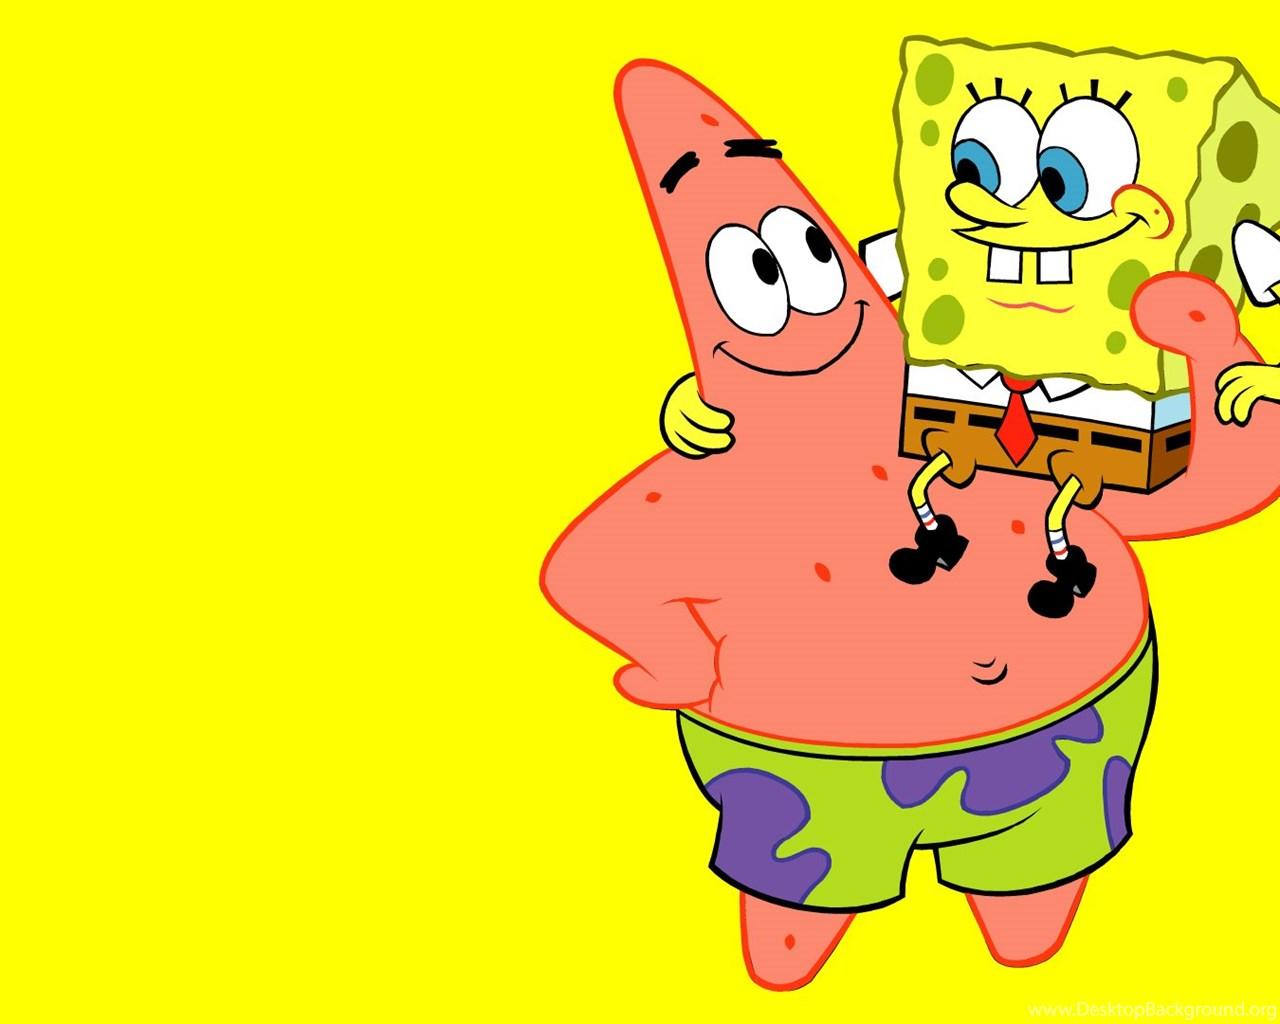 High Resolution Spongebob Squarepants And Patrick Star Wallpapers